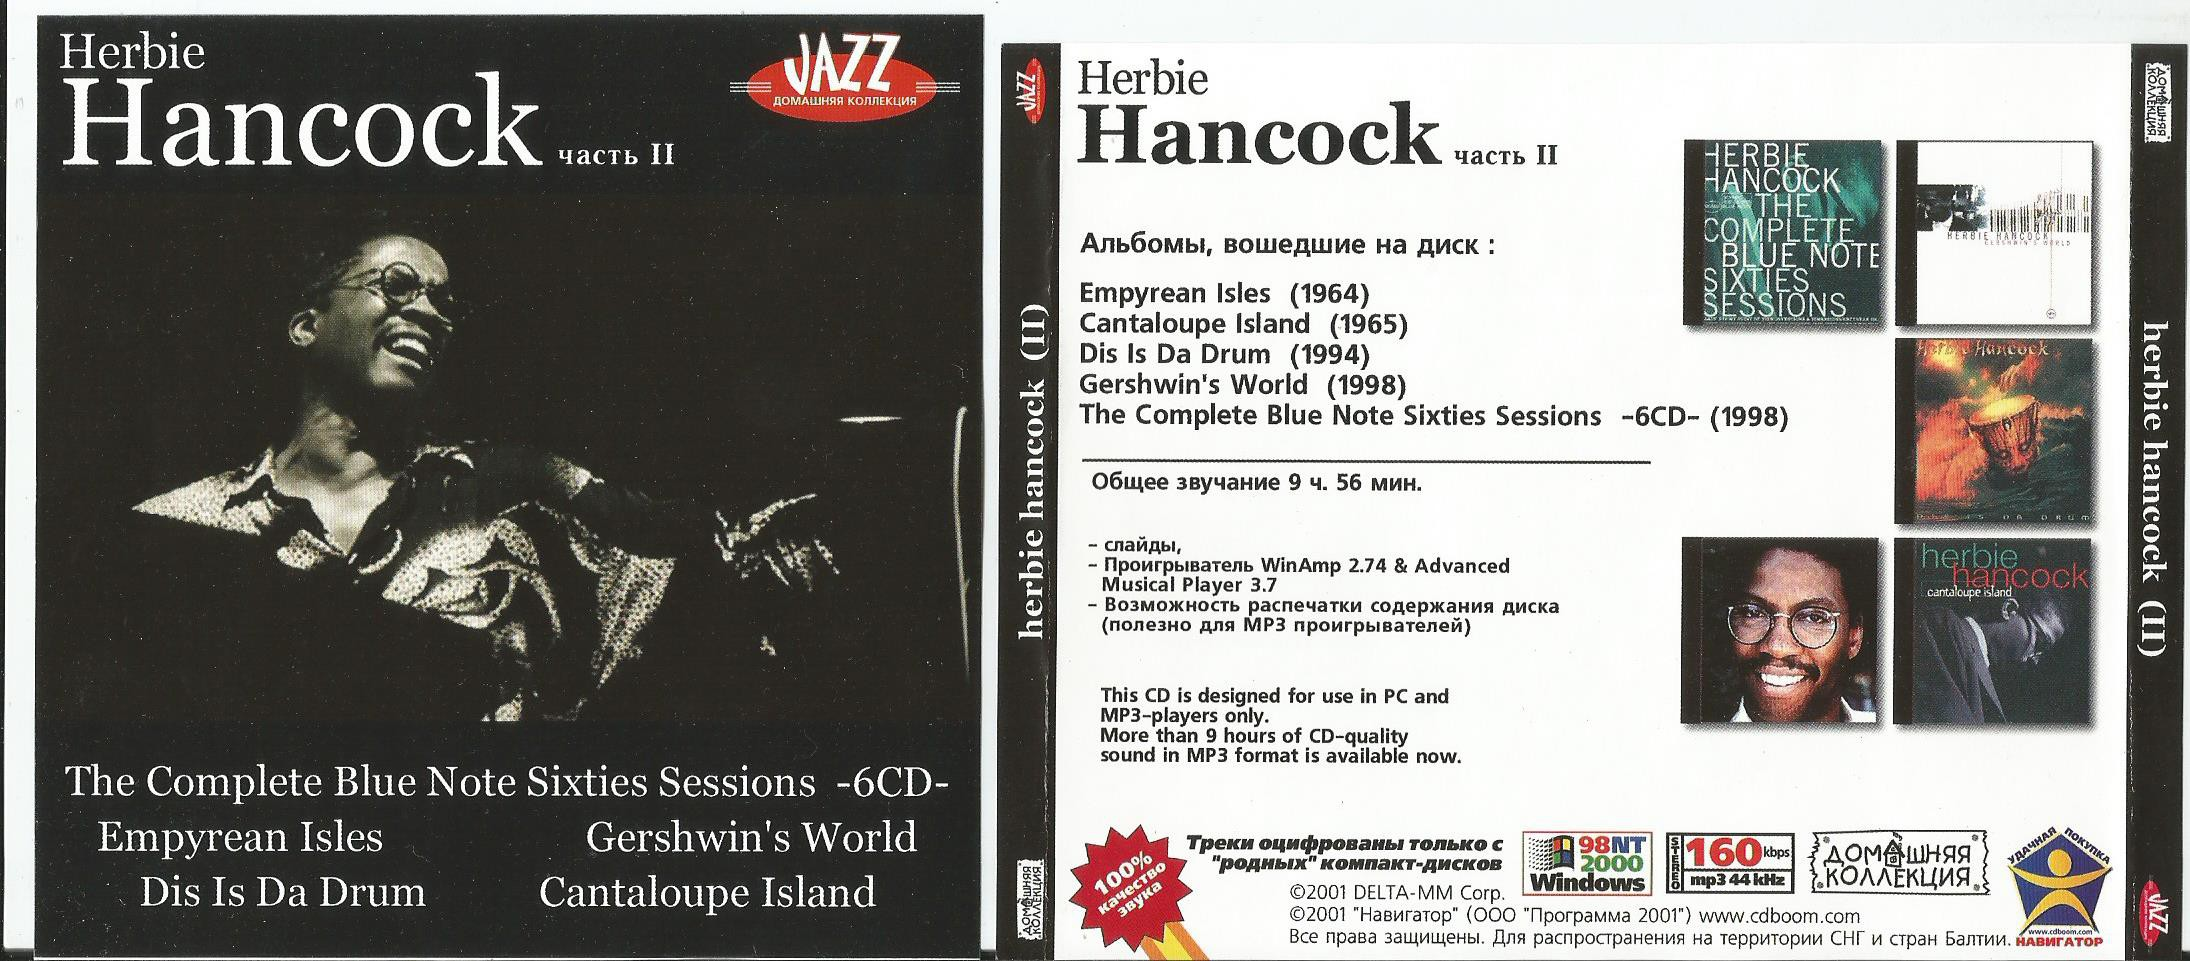 Herbie Hancock V S O P Quintet Records Lps Vinyl And